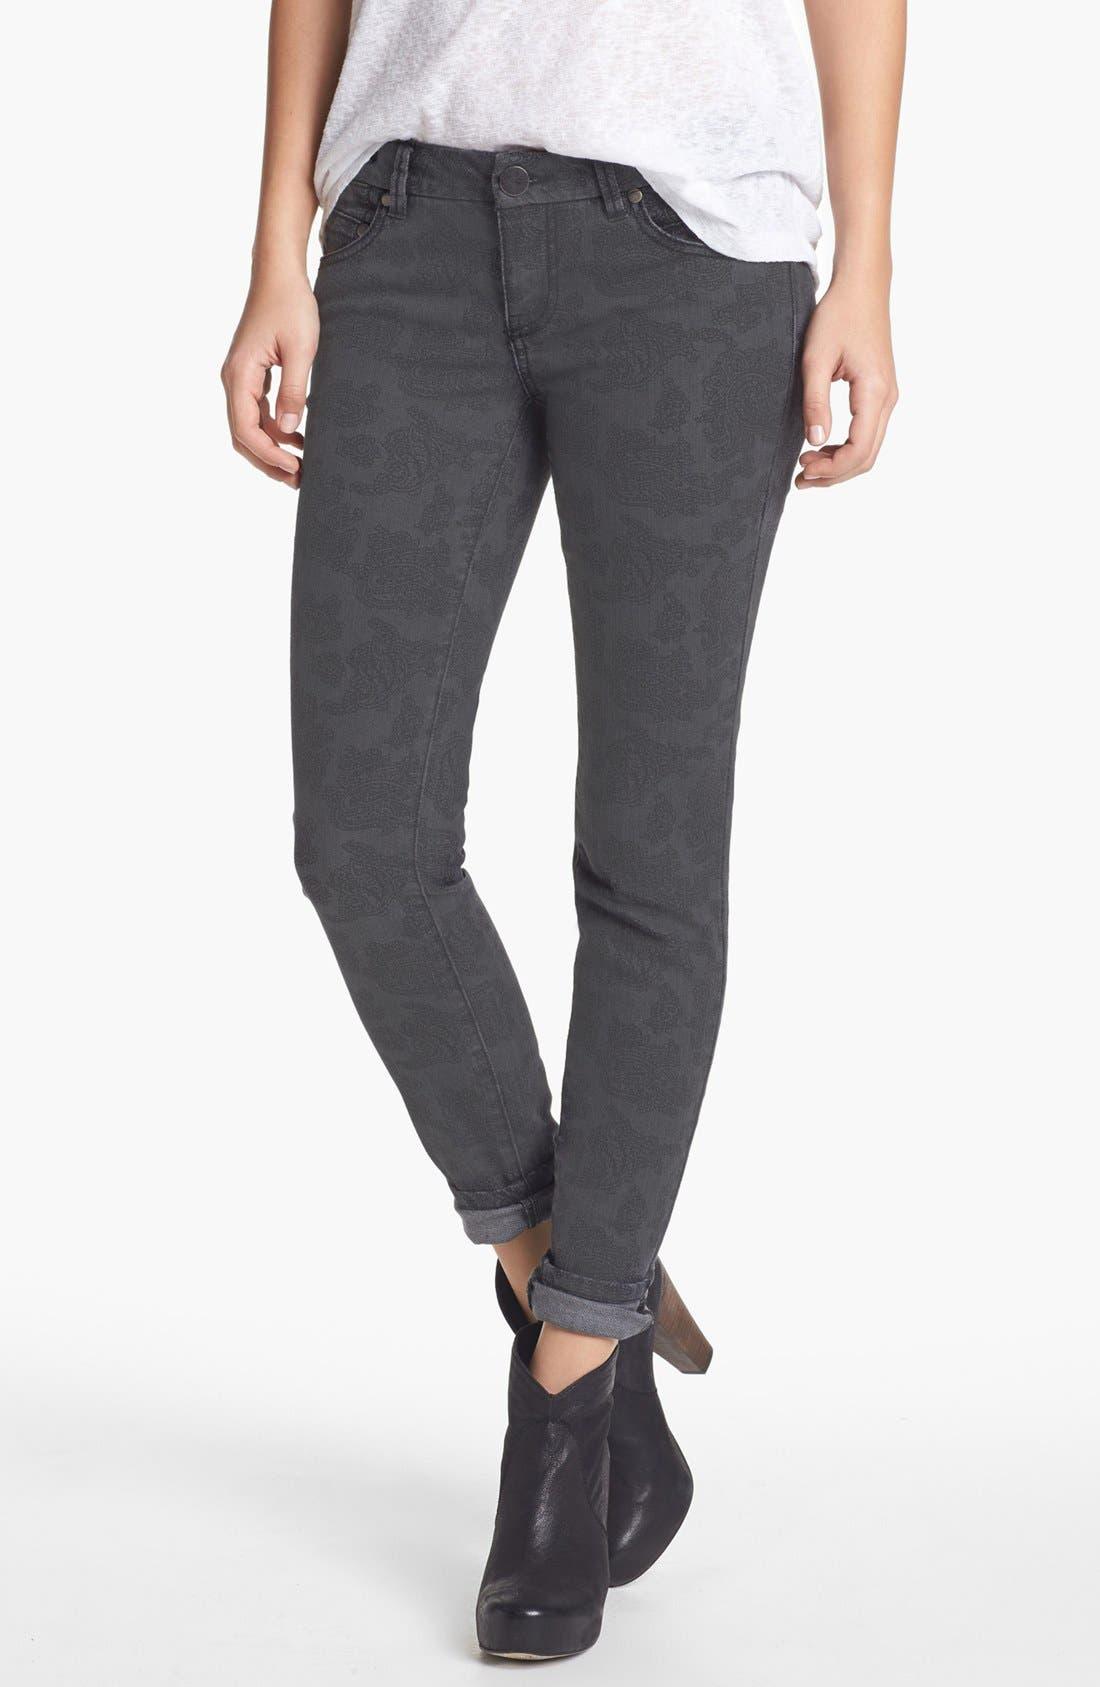 Main Image - Fire Paisley Print Skinny Jeans (Charcoal) (Juniors)